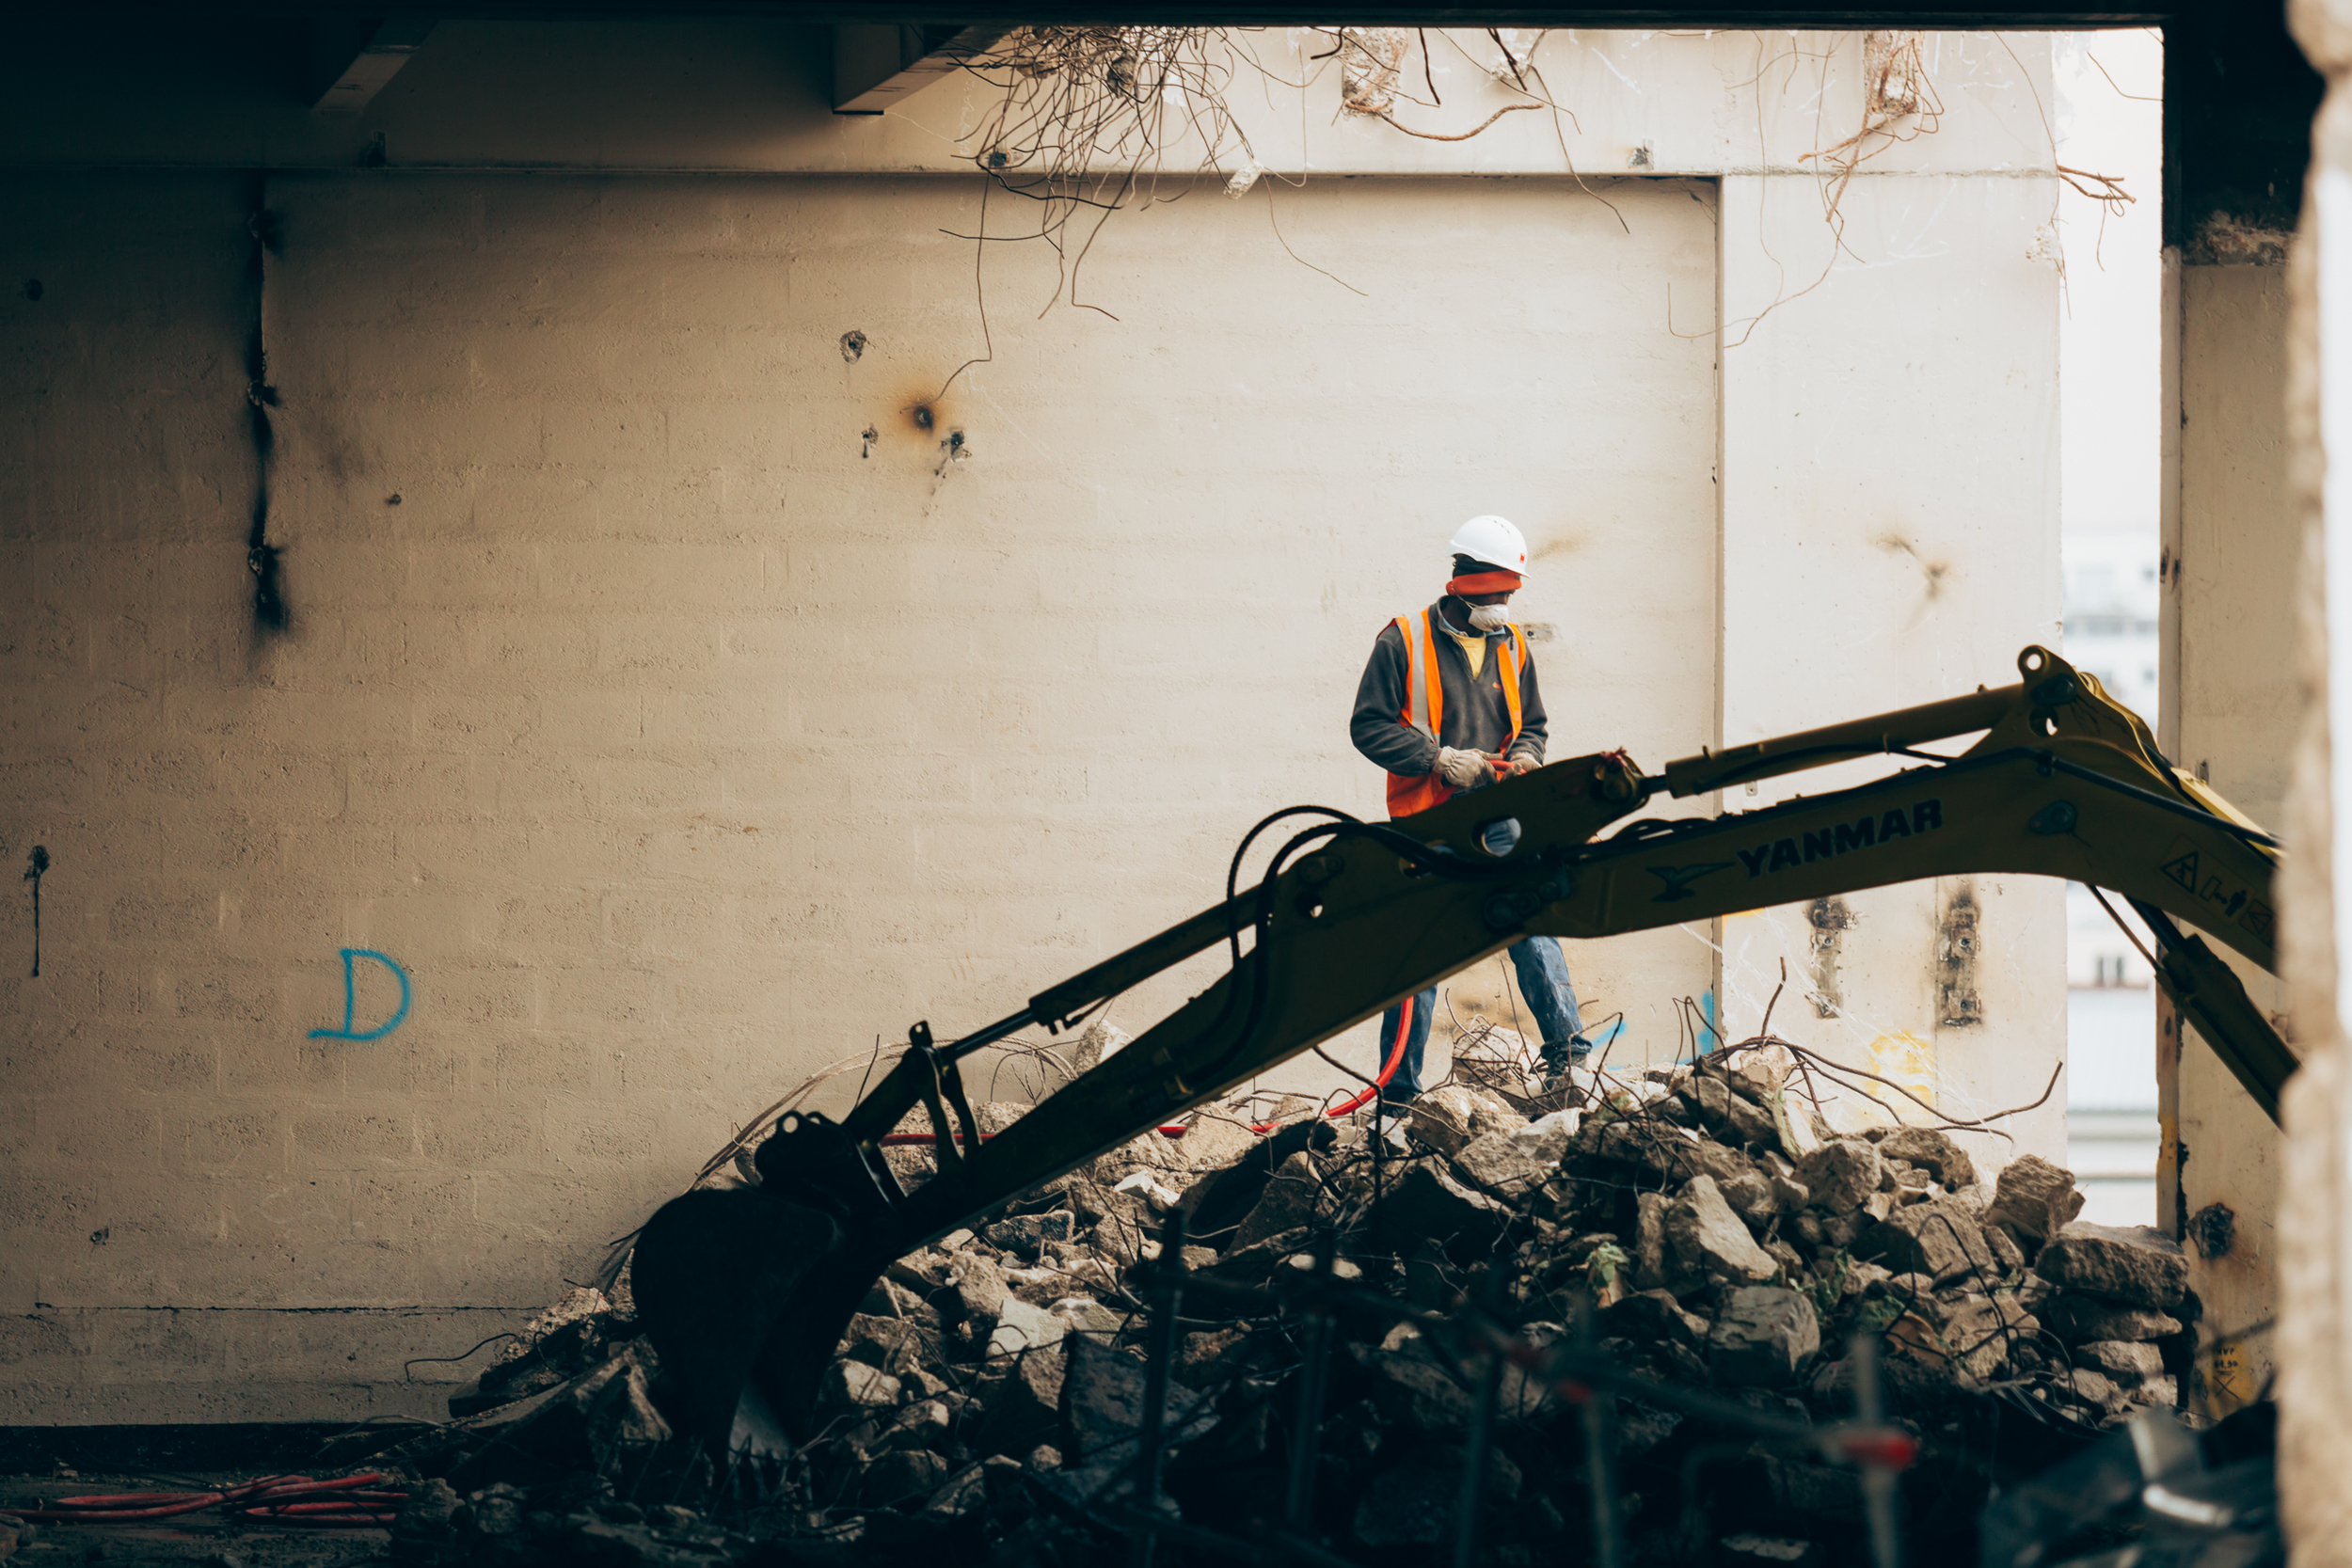 2015-10-12, Vivacity-Eiffage (chantier)-20.jpg